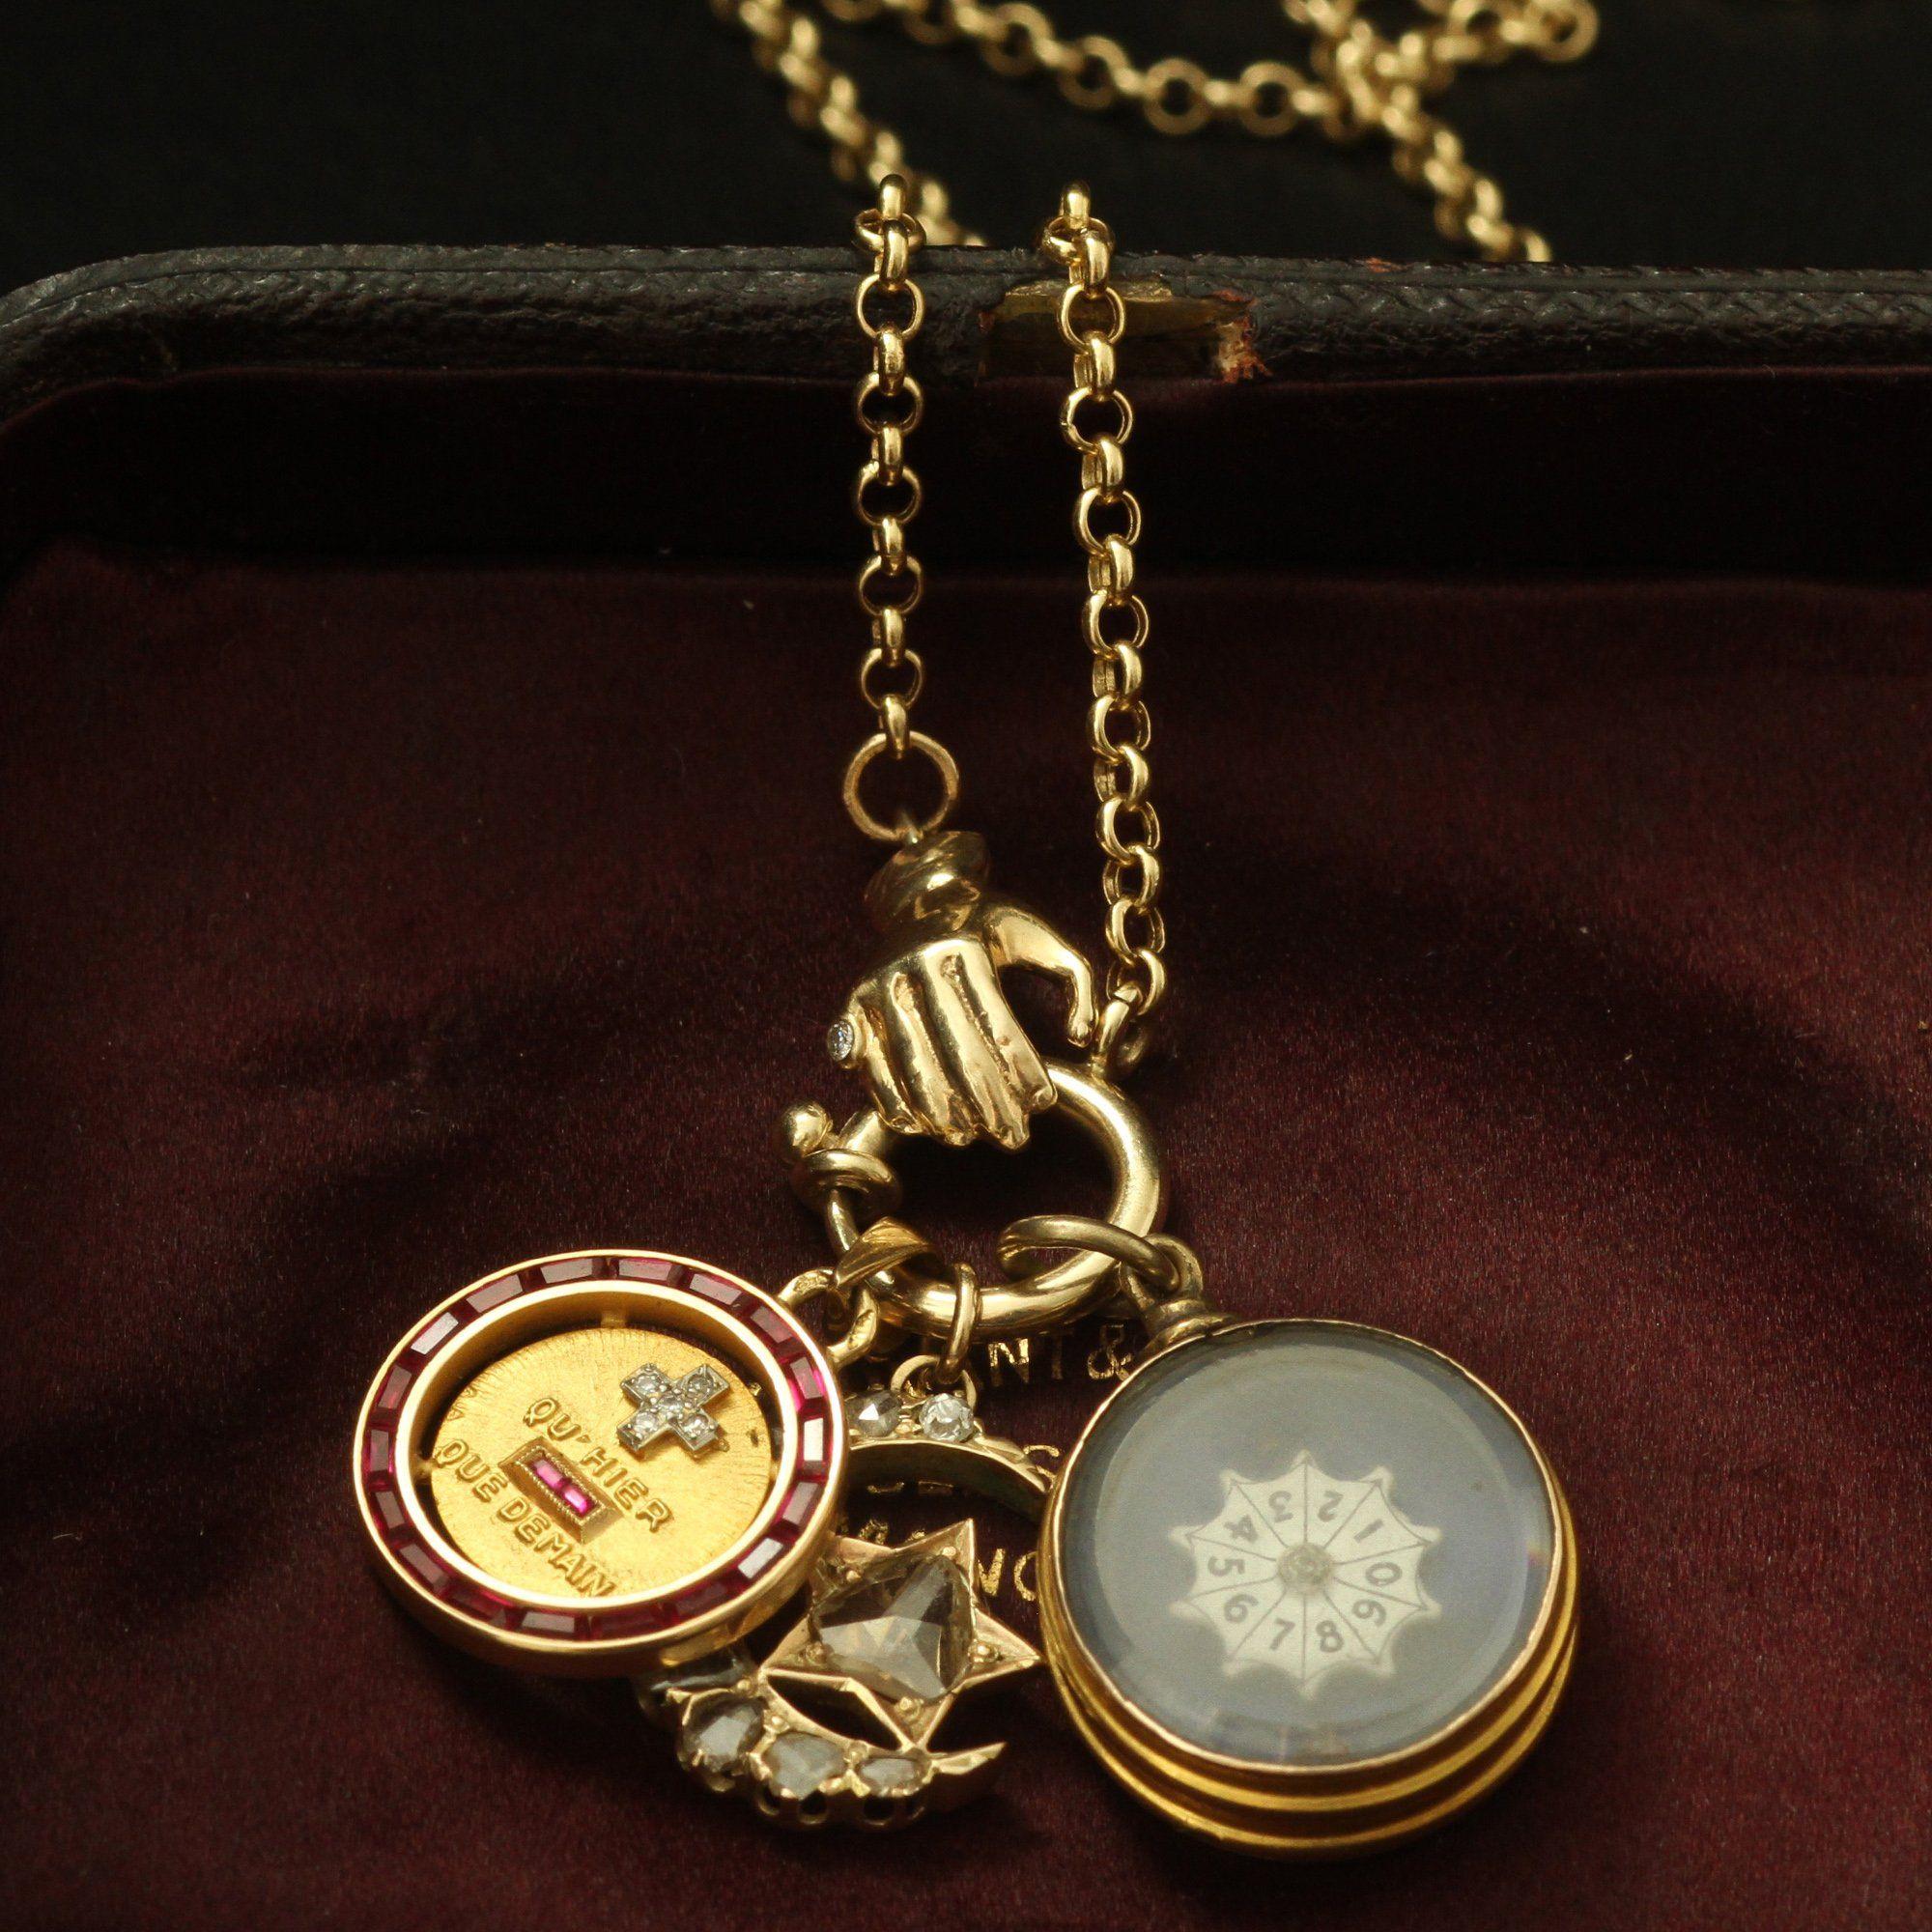 Handclasp Charm Base Necklace